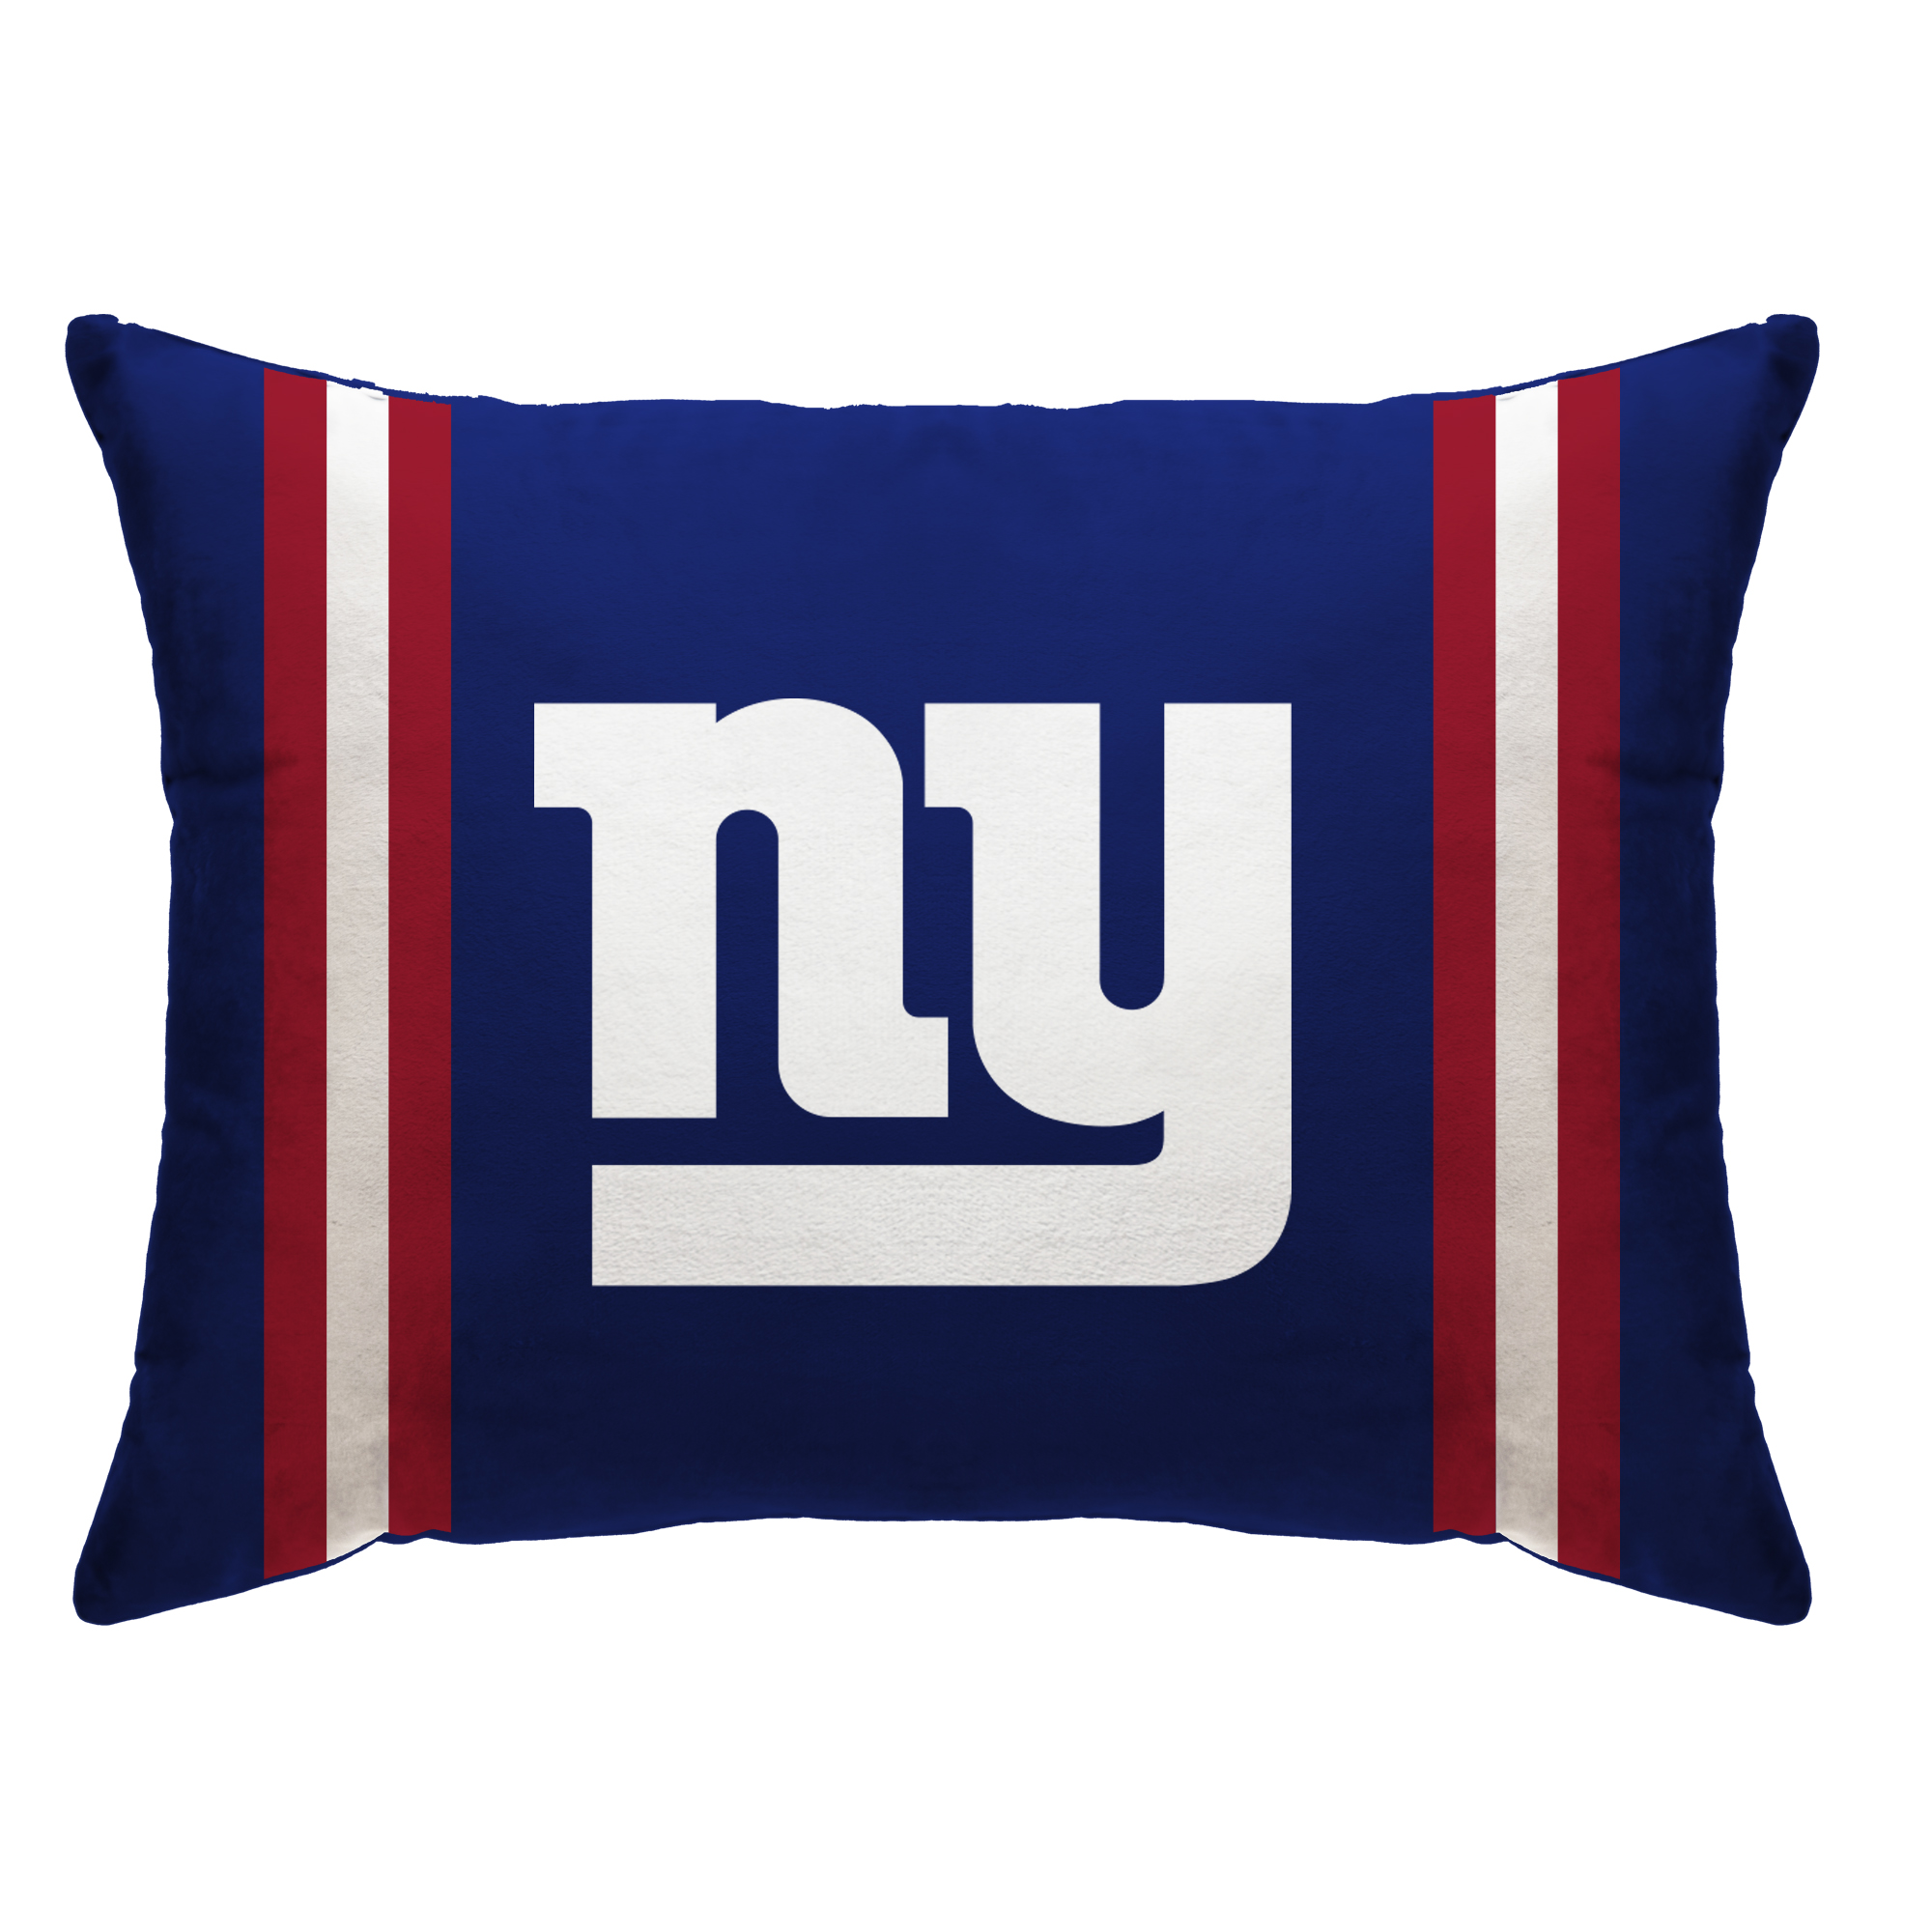 Green NEW YORK JETS 20x26 Pegasus Sports NFL DOT DESIGN BED PILLOW